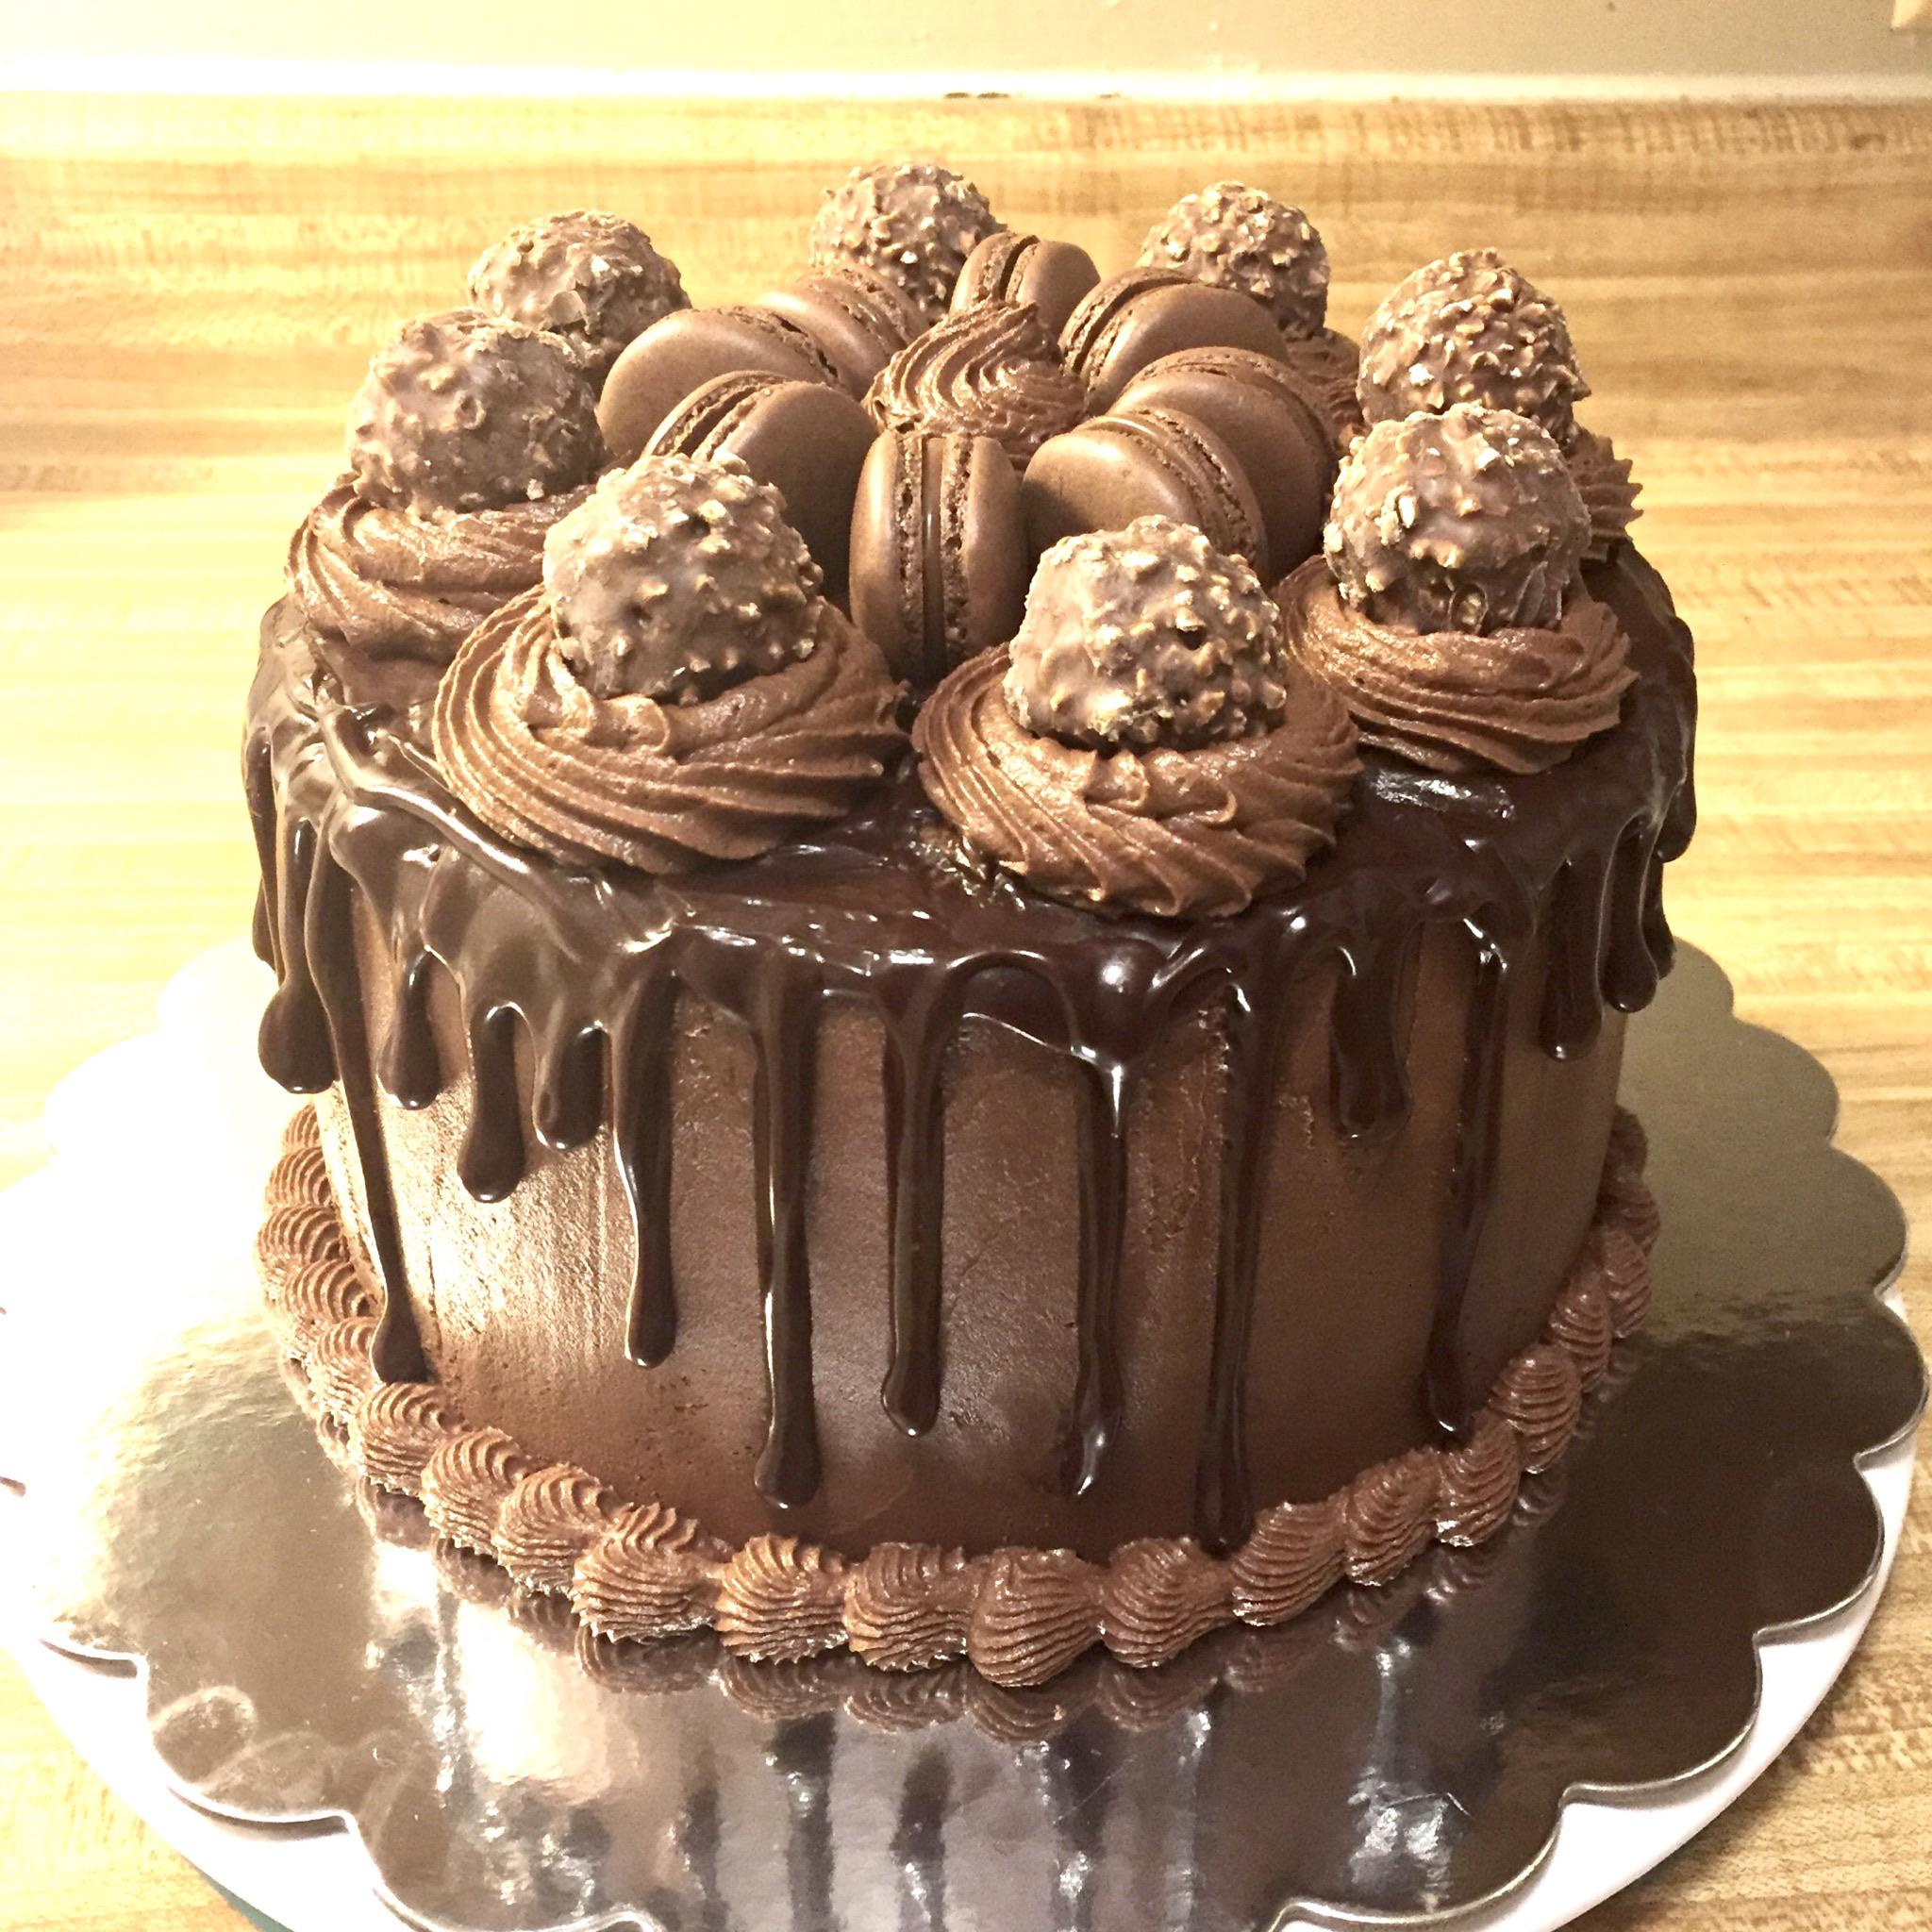 Nutella Cake For Grandma S 80th Birthday Baking